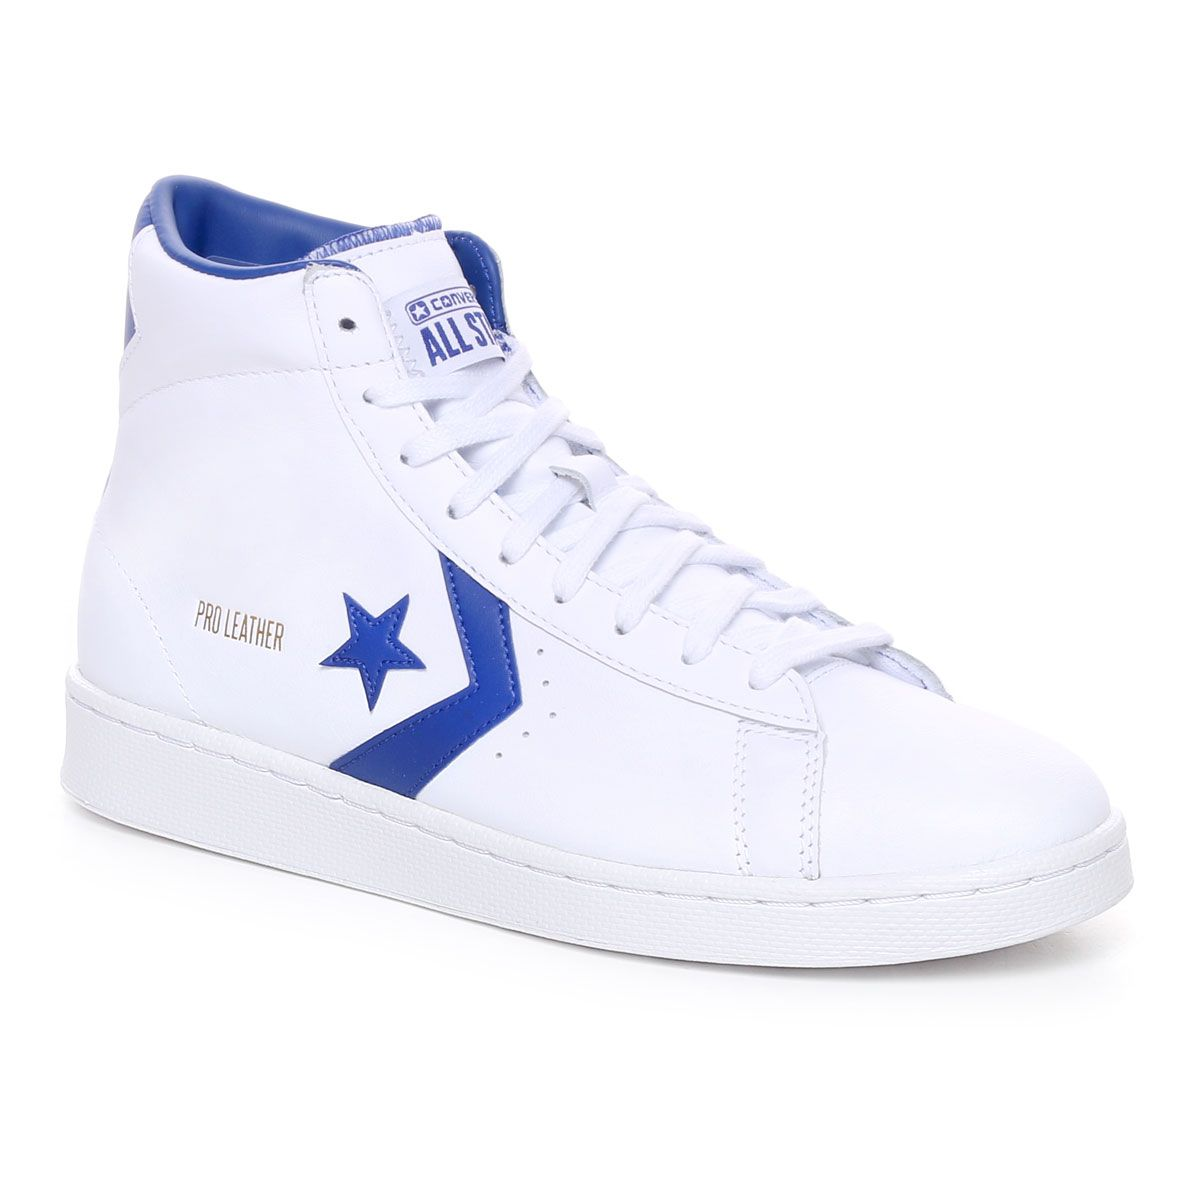 Converse Pro Leather Seasonal Uomo Bianco Blu